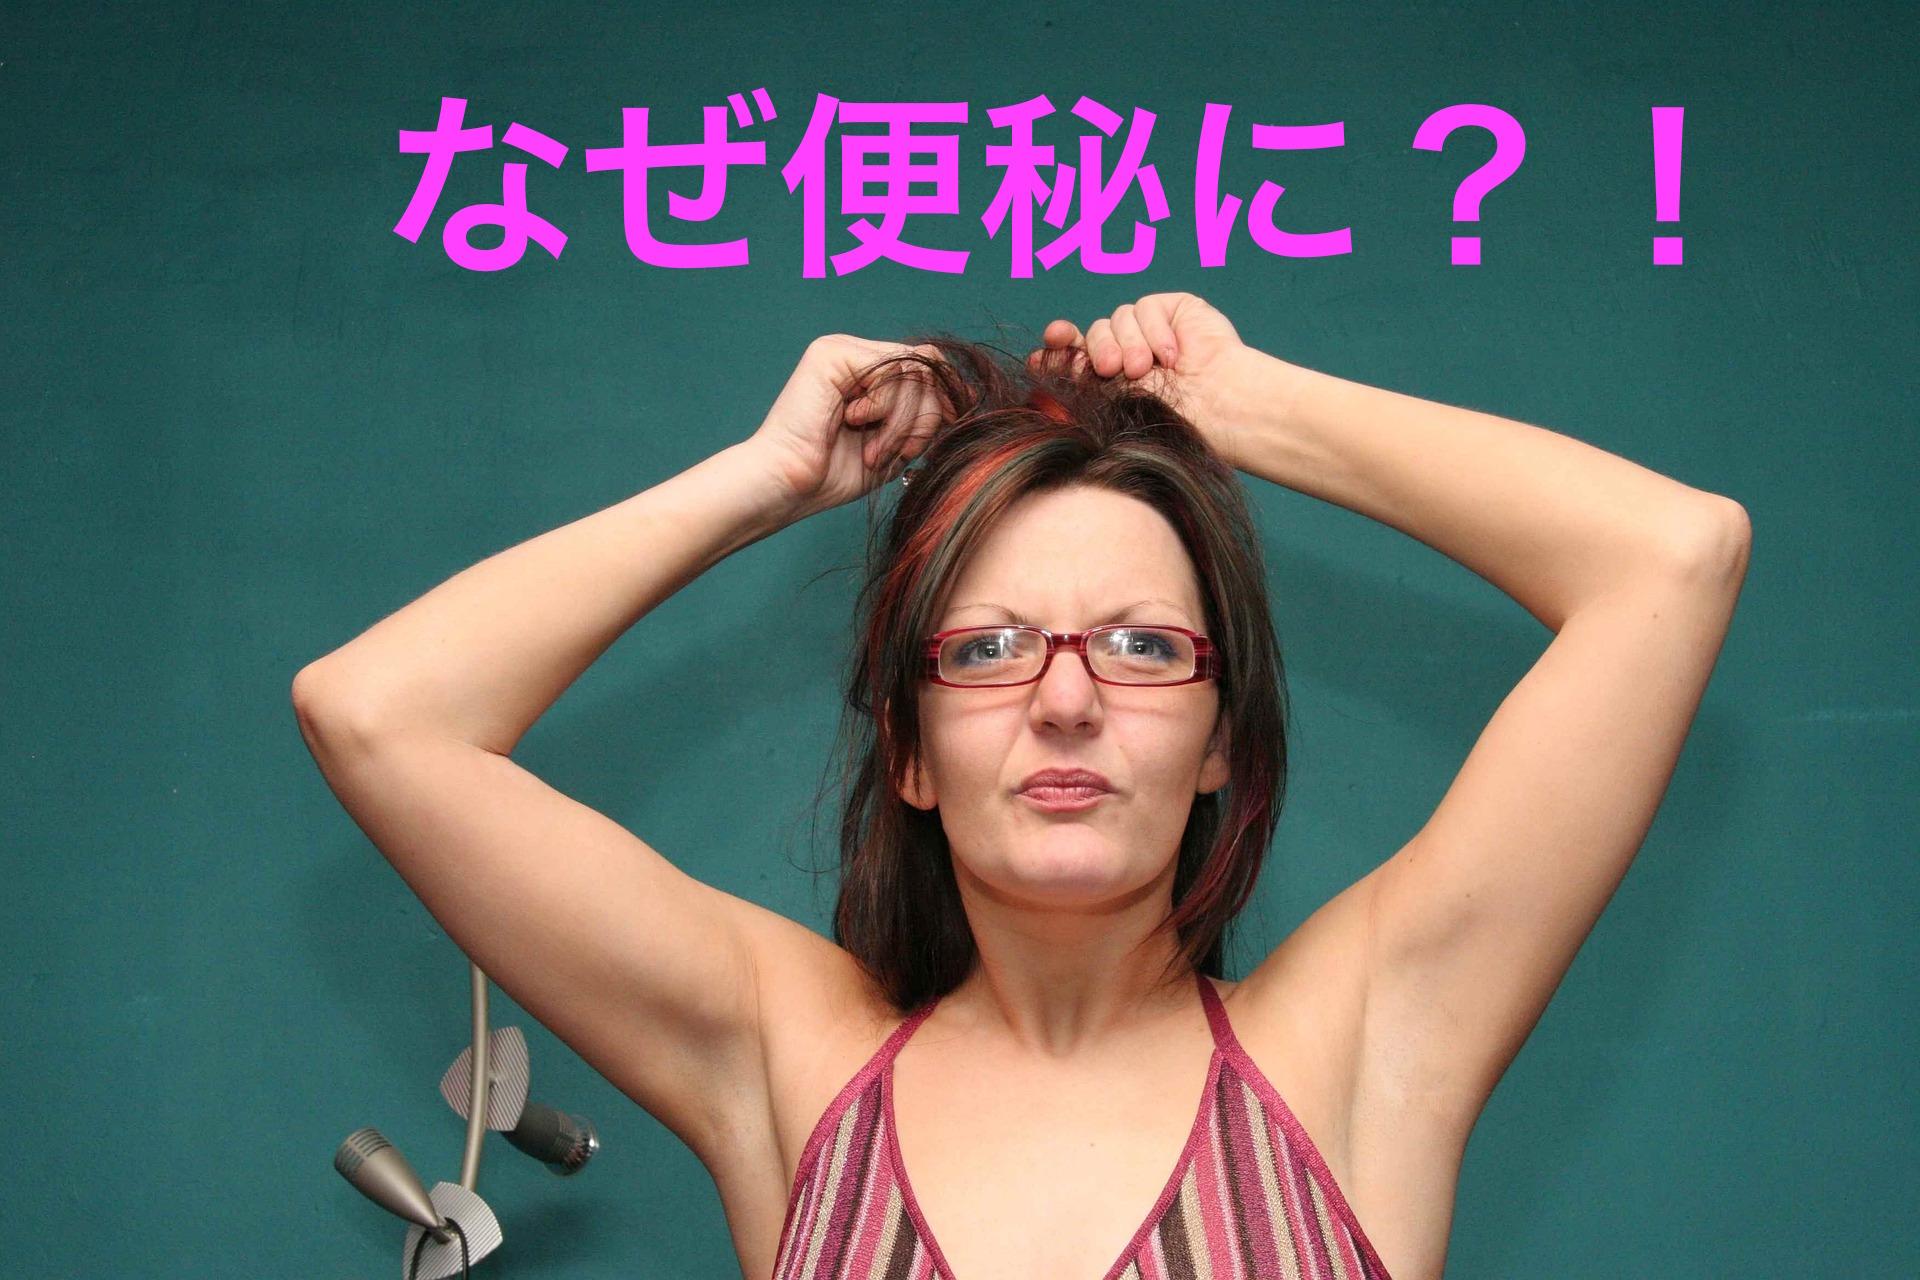 woman-thinking-835371_1920